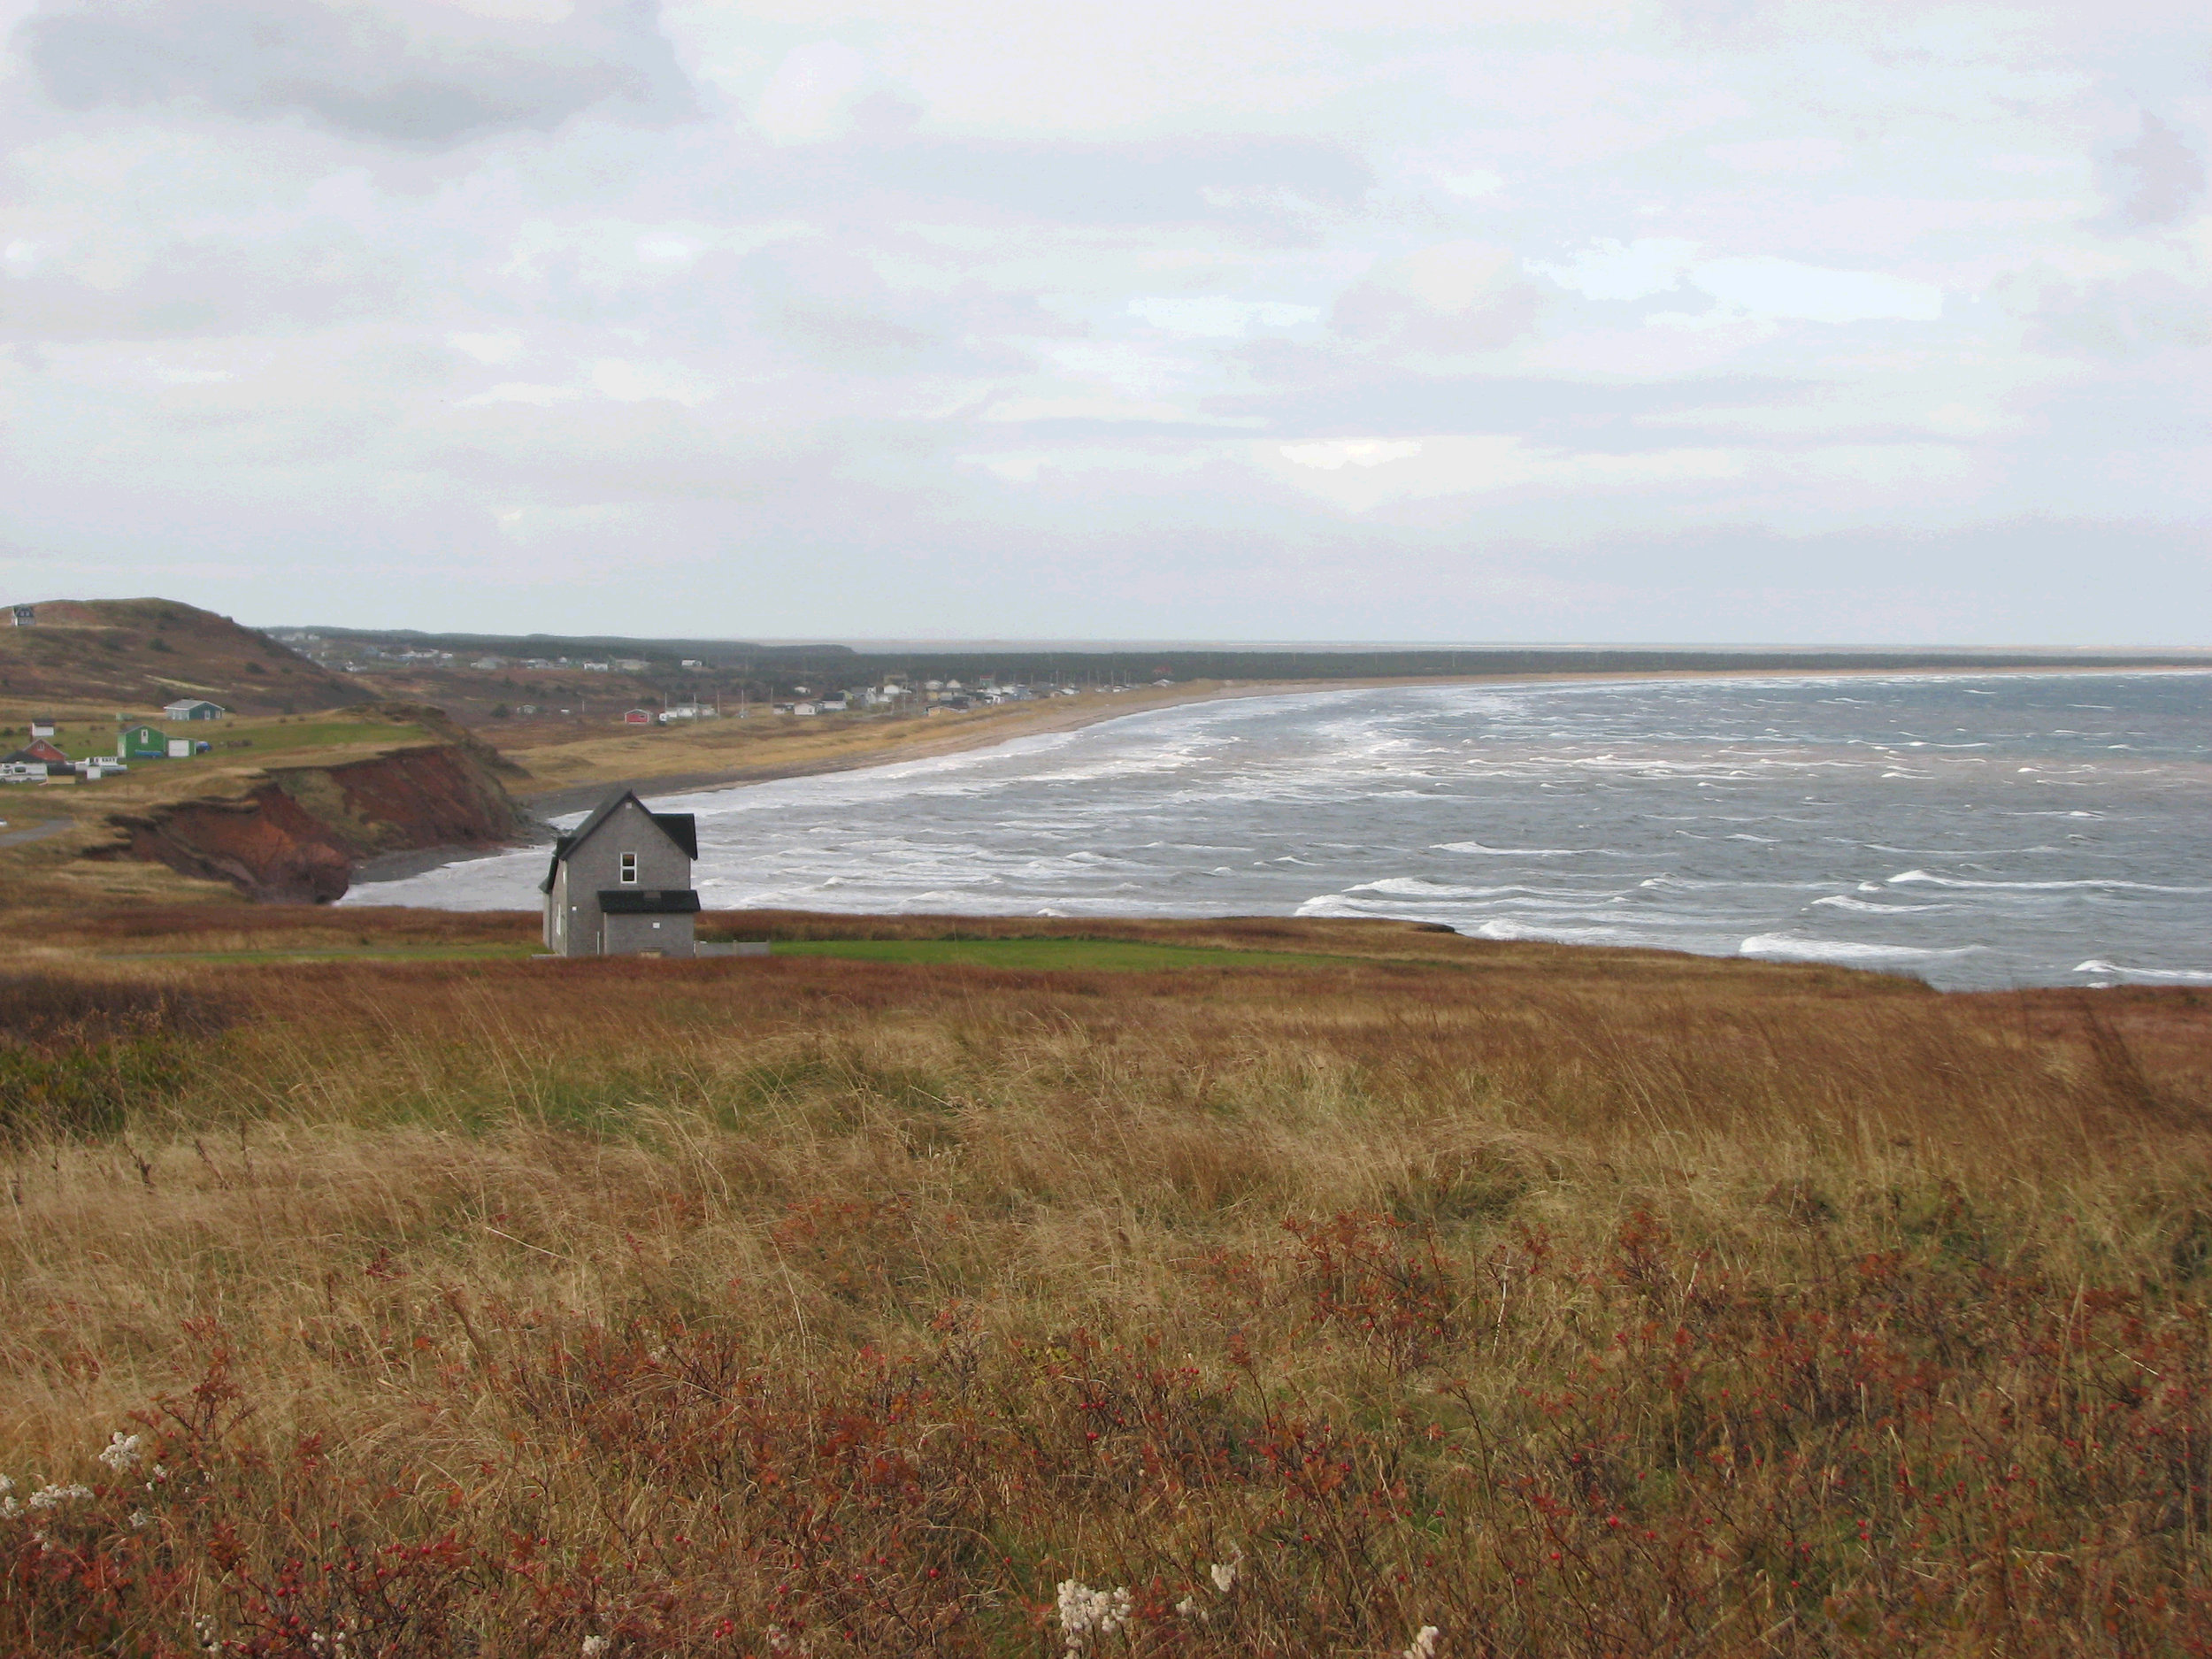 Field at Cliff_Magdalen Islands_CA.jpg